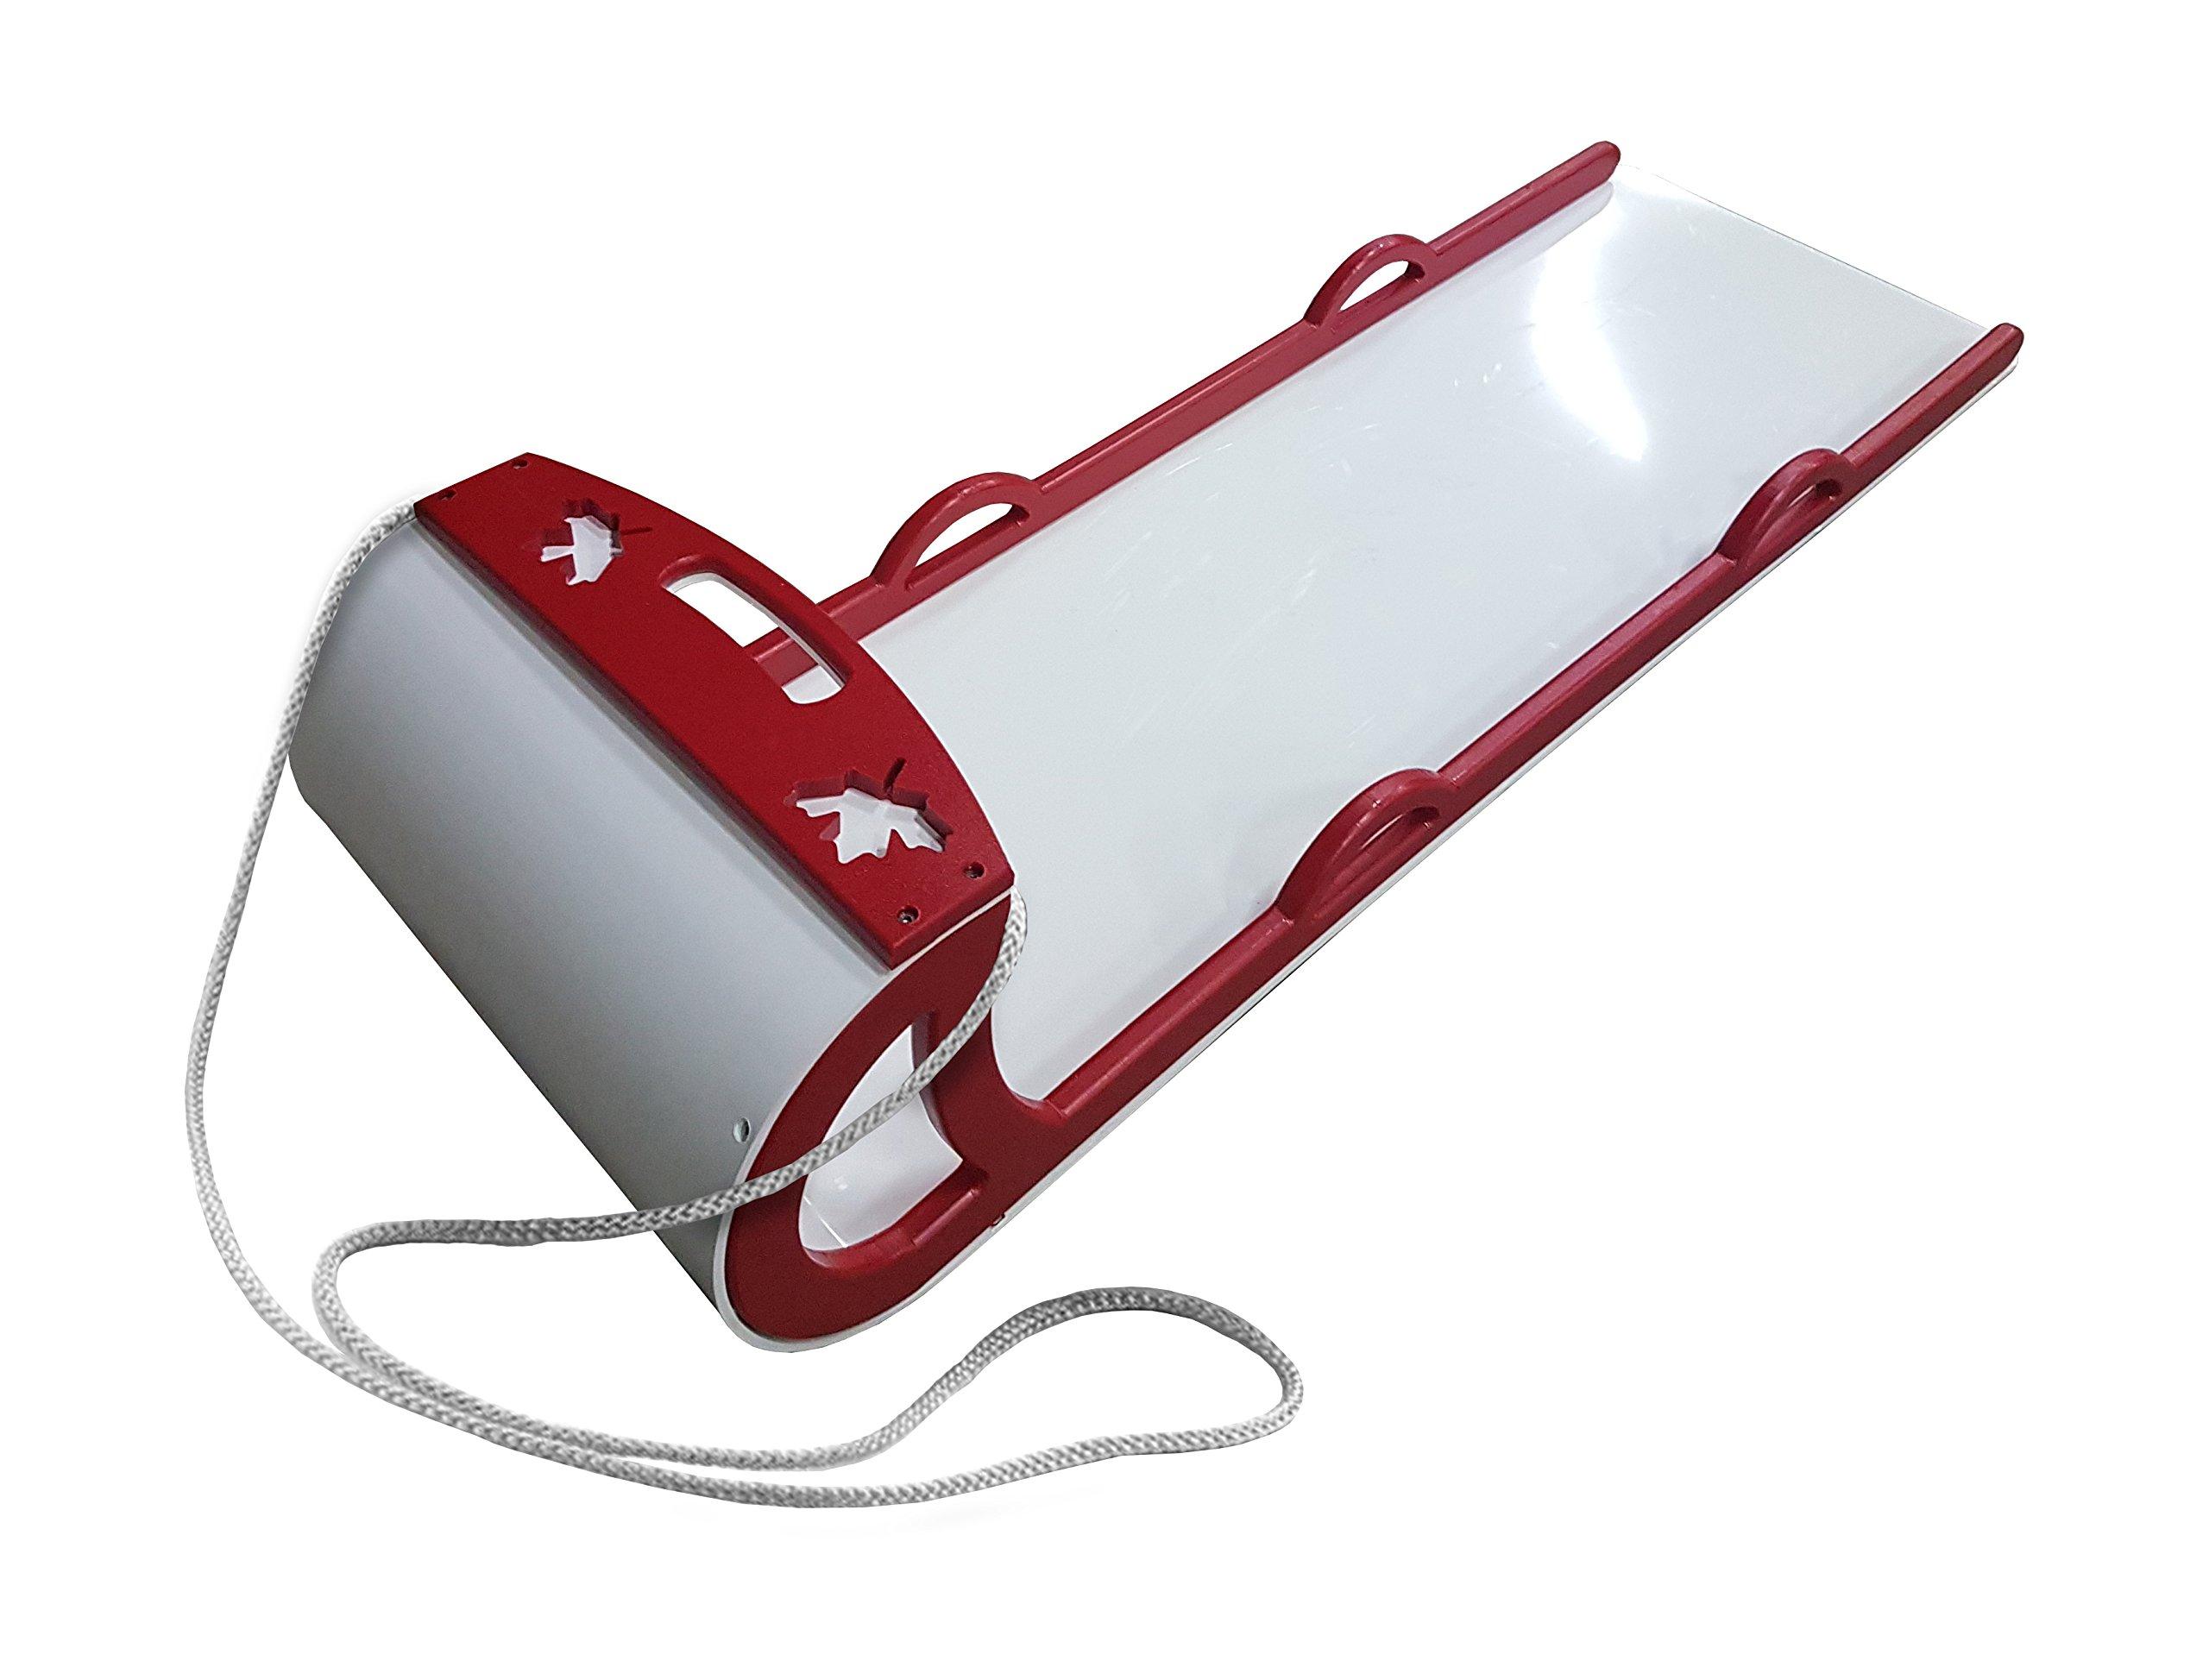 5' Toboggan Red - Recycled Plastic